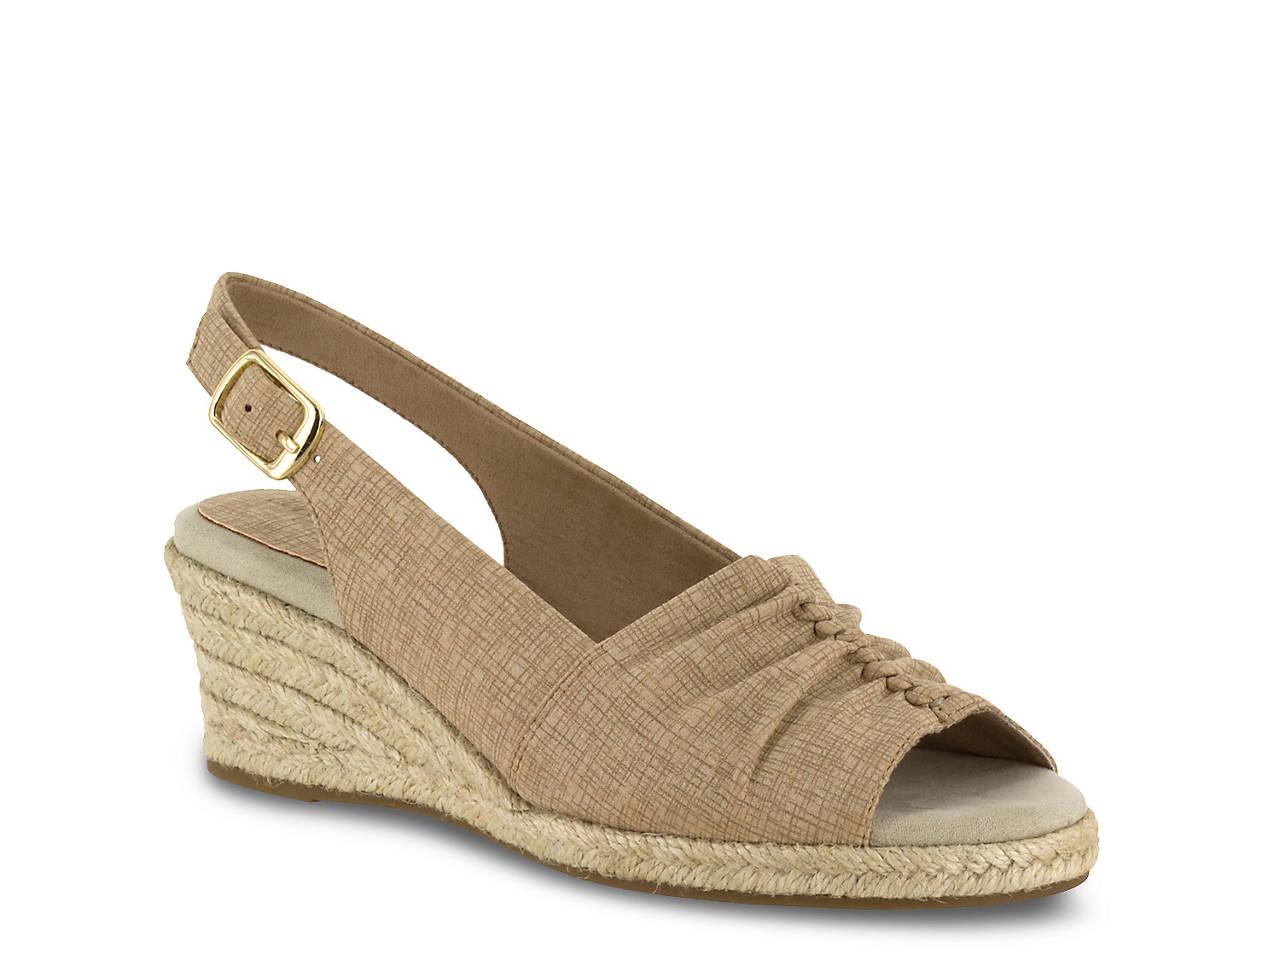 Easy Street Women s Kindly Espadrille Wedge Sandal B01MZYQ2W1